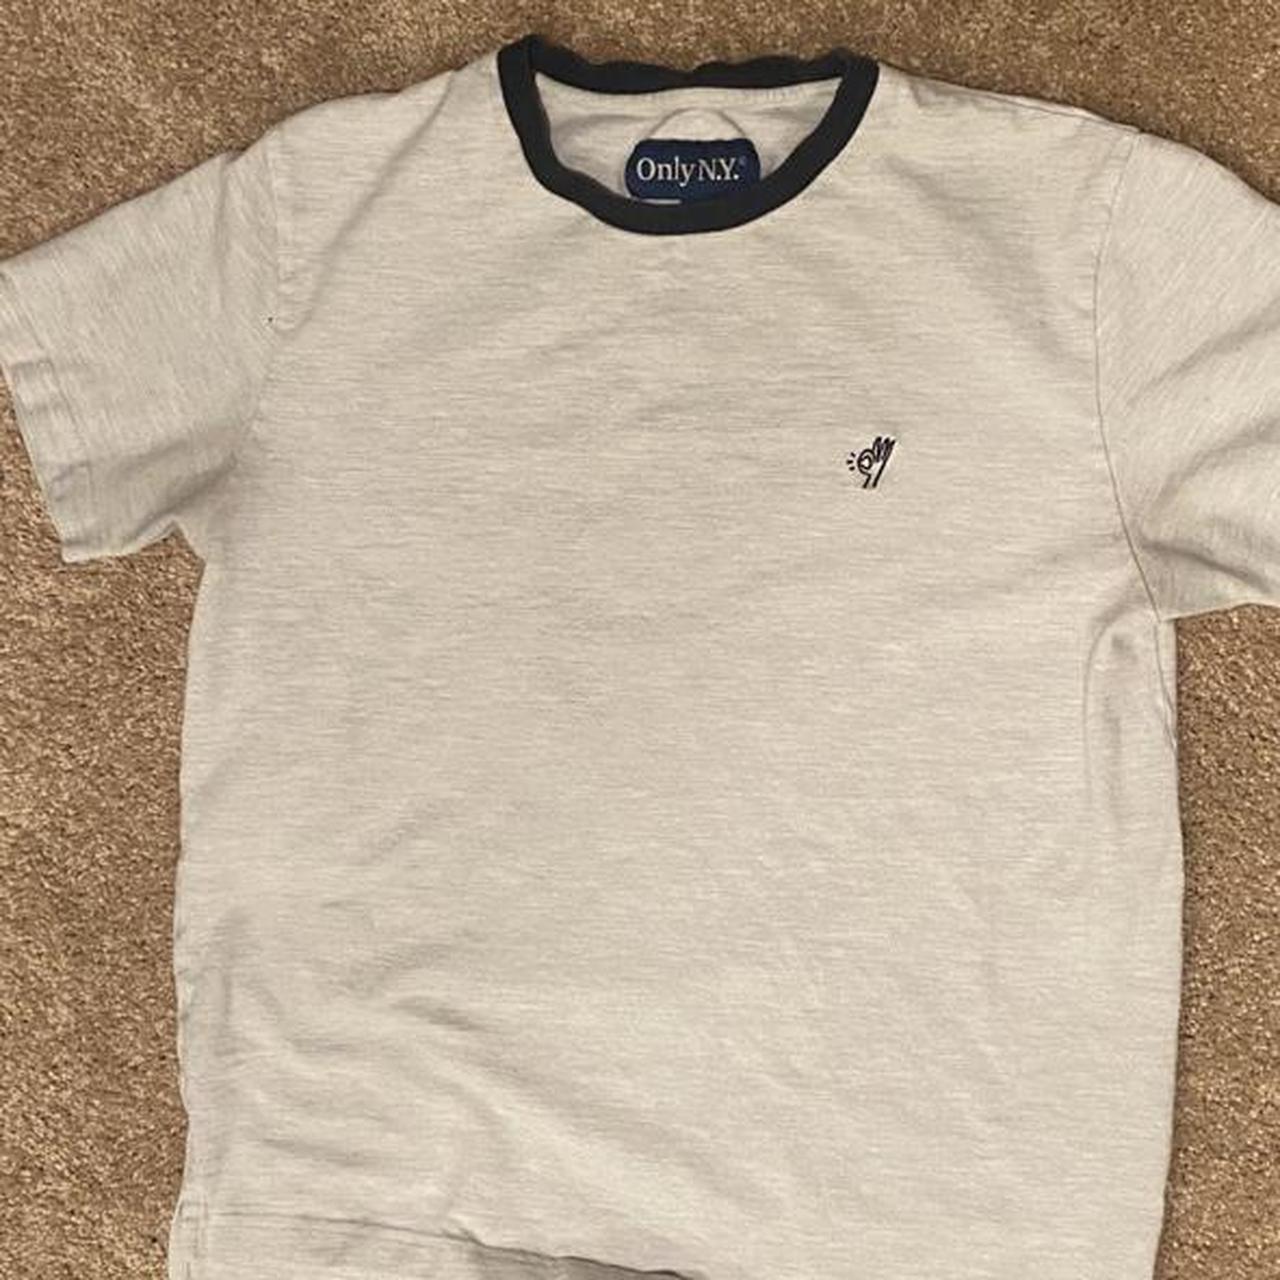 Product Image 1 - Only NY OK t-shirt   #onlyny #newyork